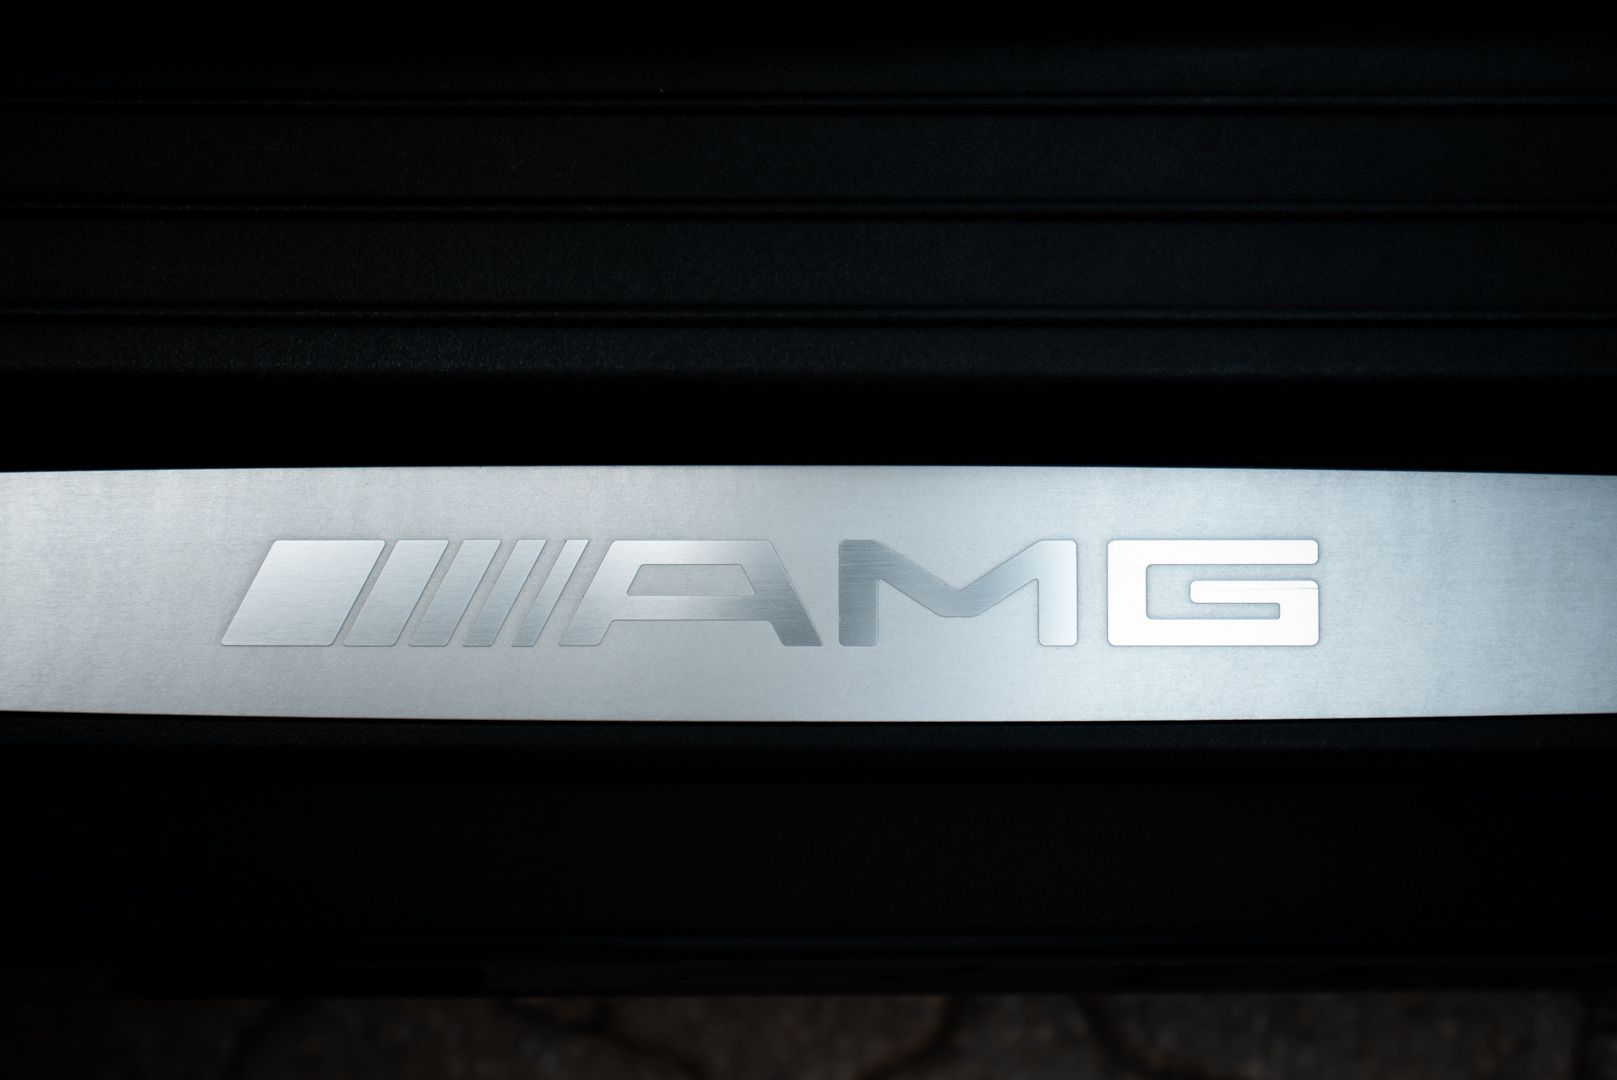 2006 Mercedes-Benz SL65 AMG 73804